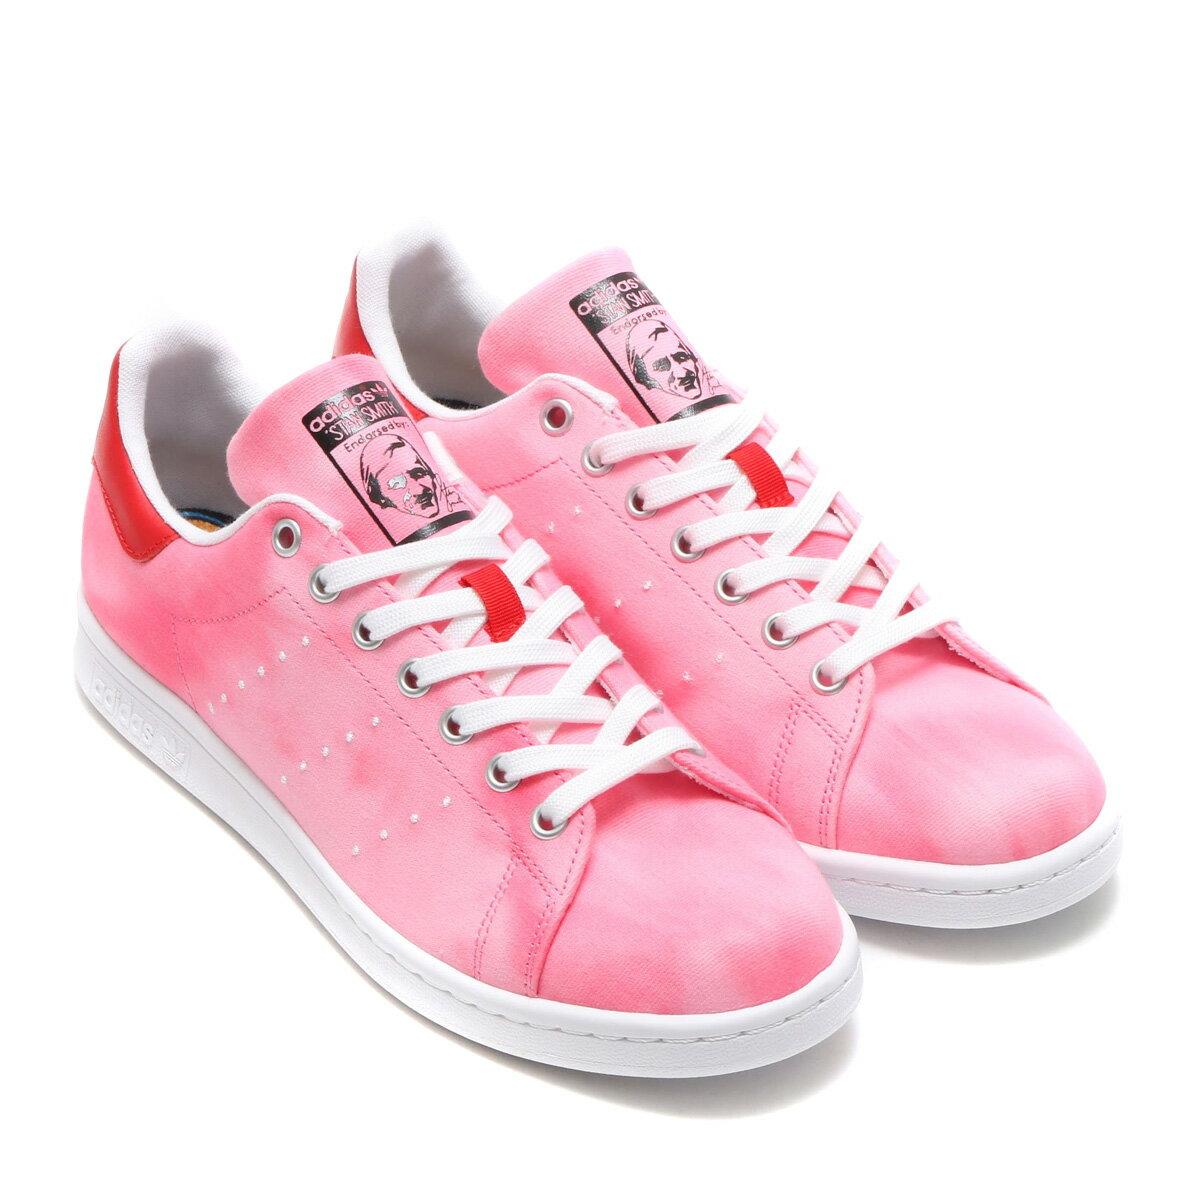 adidas Originals PW HU HOLI STAN SMITH (アディダス オリジナルス ファレル ウィリアムス HU HOLI スタンスミス) Red / Running White / Running White【メンズ スニーカー】18SS-S